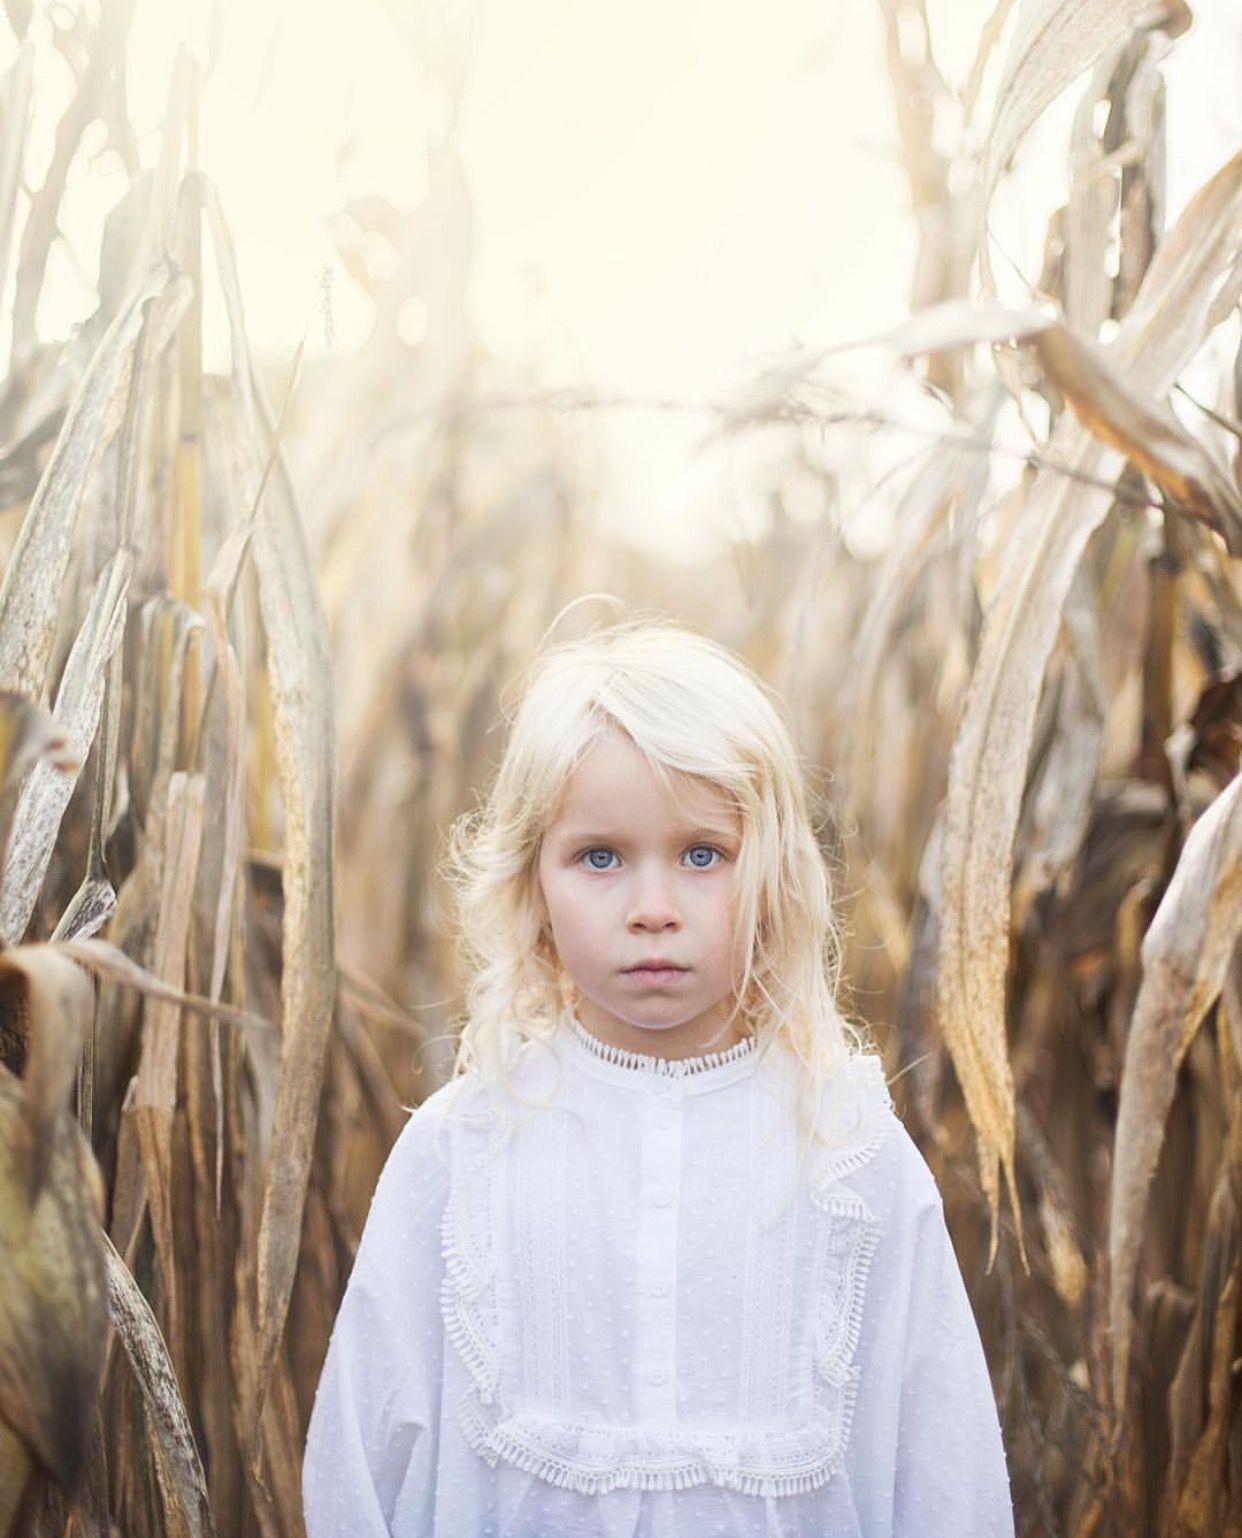 Photo: Pernilla Ahlsén  #summer #sun #field #light #storahavet